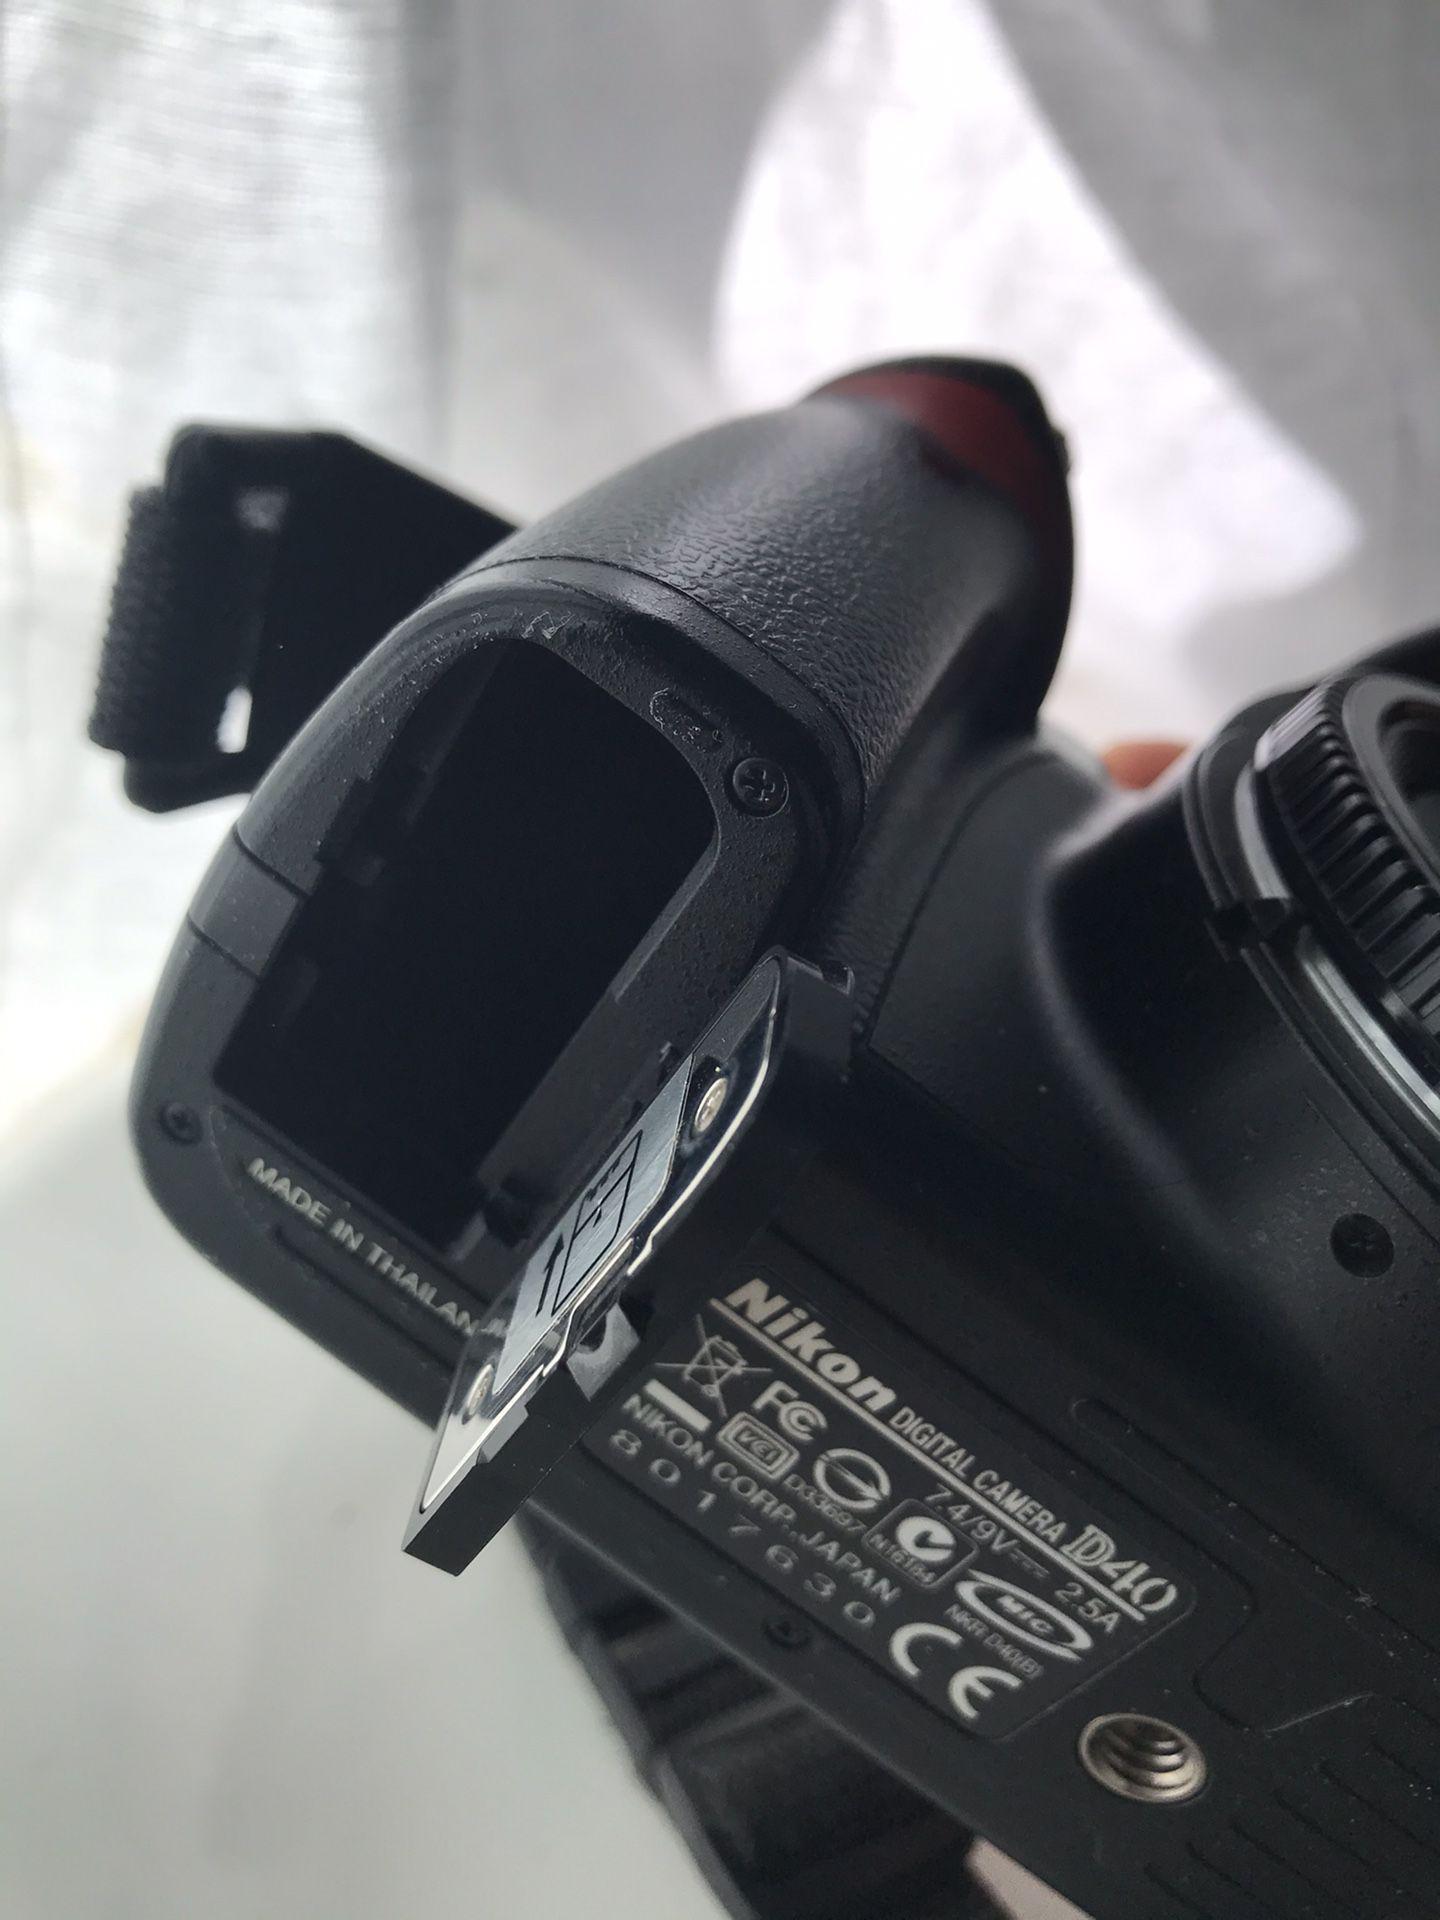 Nikon D40 6.1 MP Digital Camera DSLR Body only